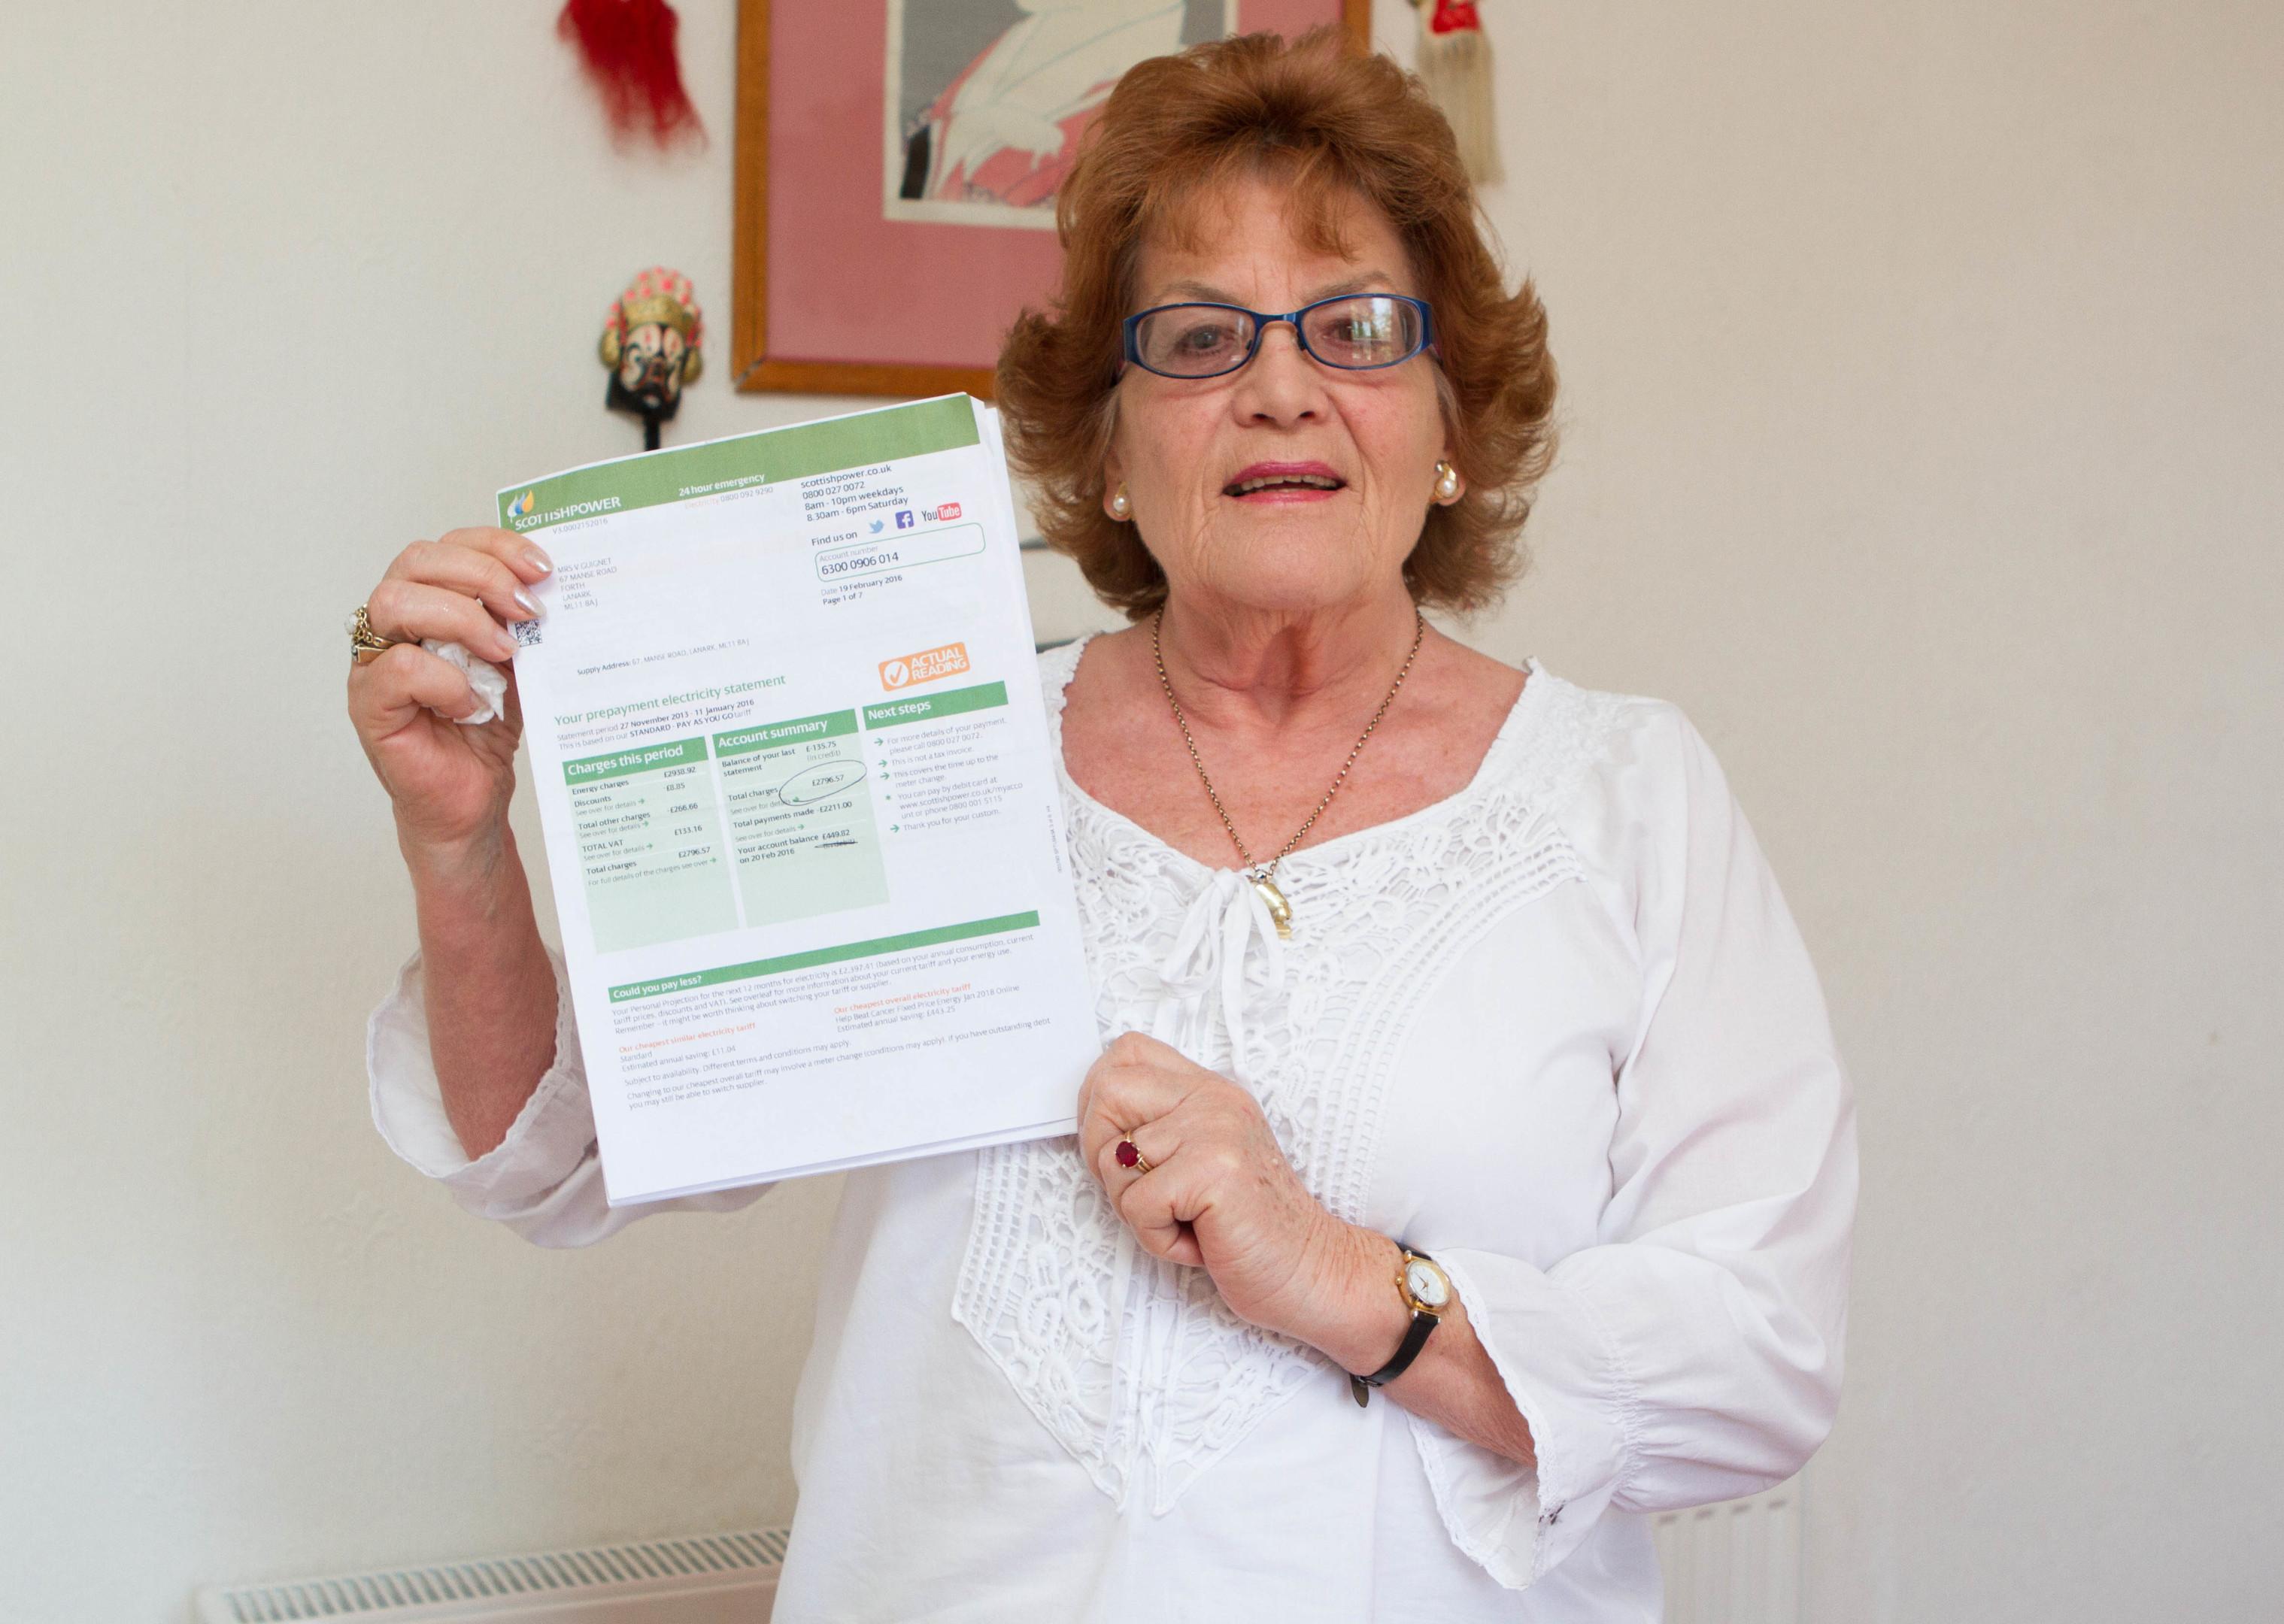 Violet Guignet had problems with her ScottishPower bill (Chris Austin / DC Thomson)